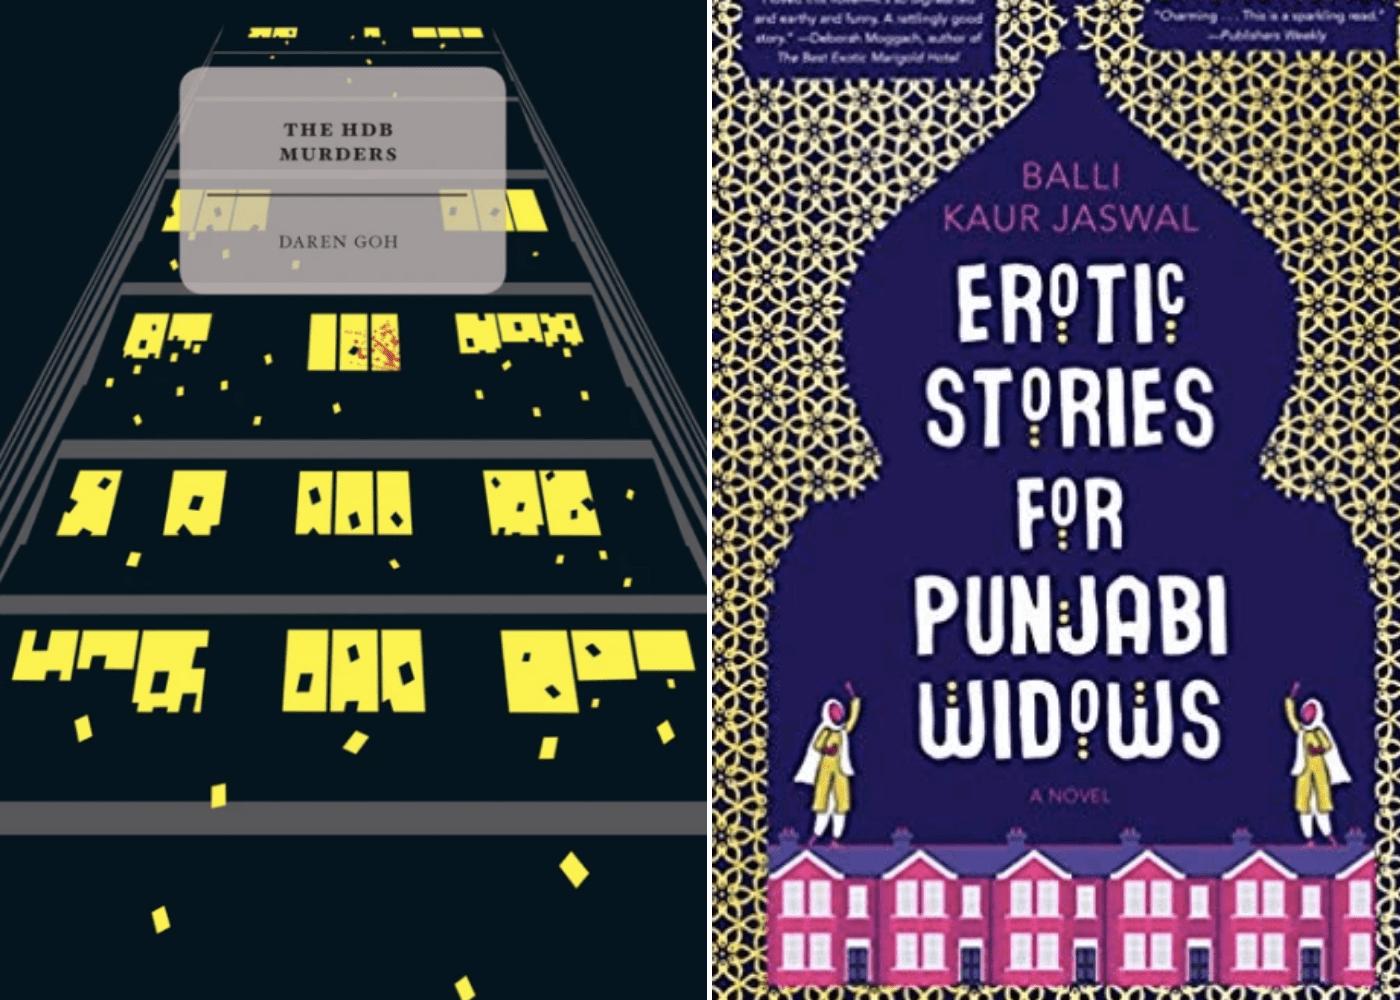 The HDB Murders by Daren Goh | Erotic Stories for Punjabi Widows by Balli Kaur Jaswal | Honeycombers Book Club